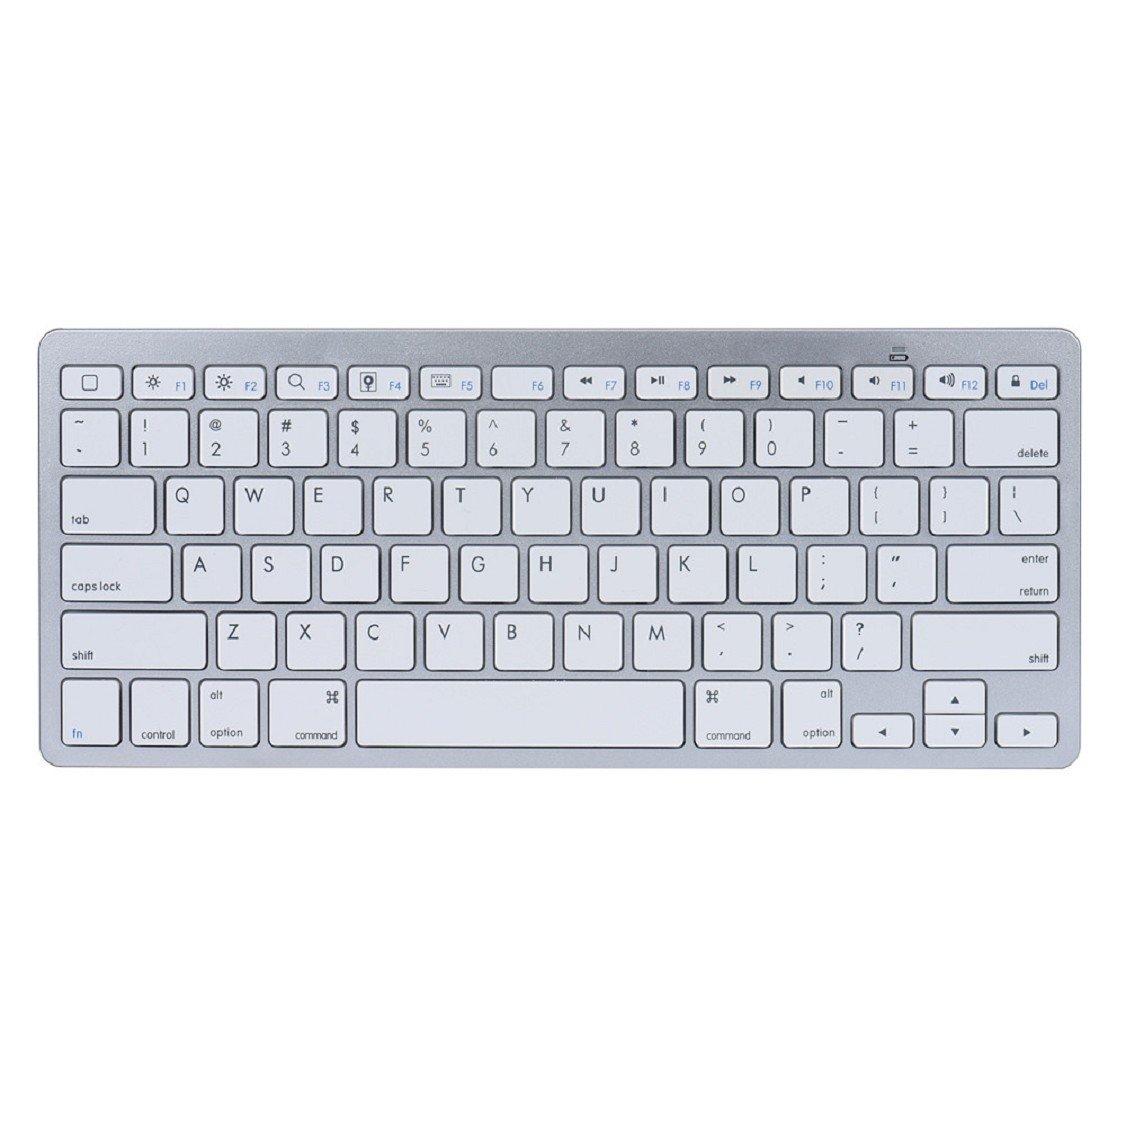 Egmy Hot! 2016 Slim Mini Bluetooth Wireless Keyboard for iPad Pro 9.7 /12.9 inch White by Egmy (Image #2)